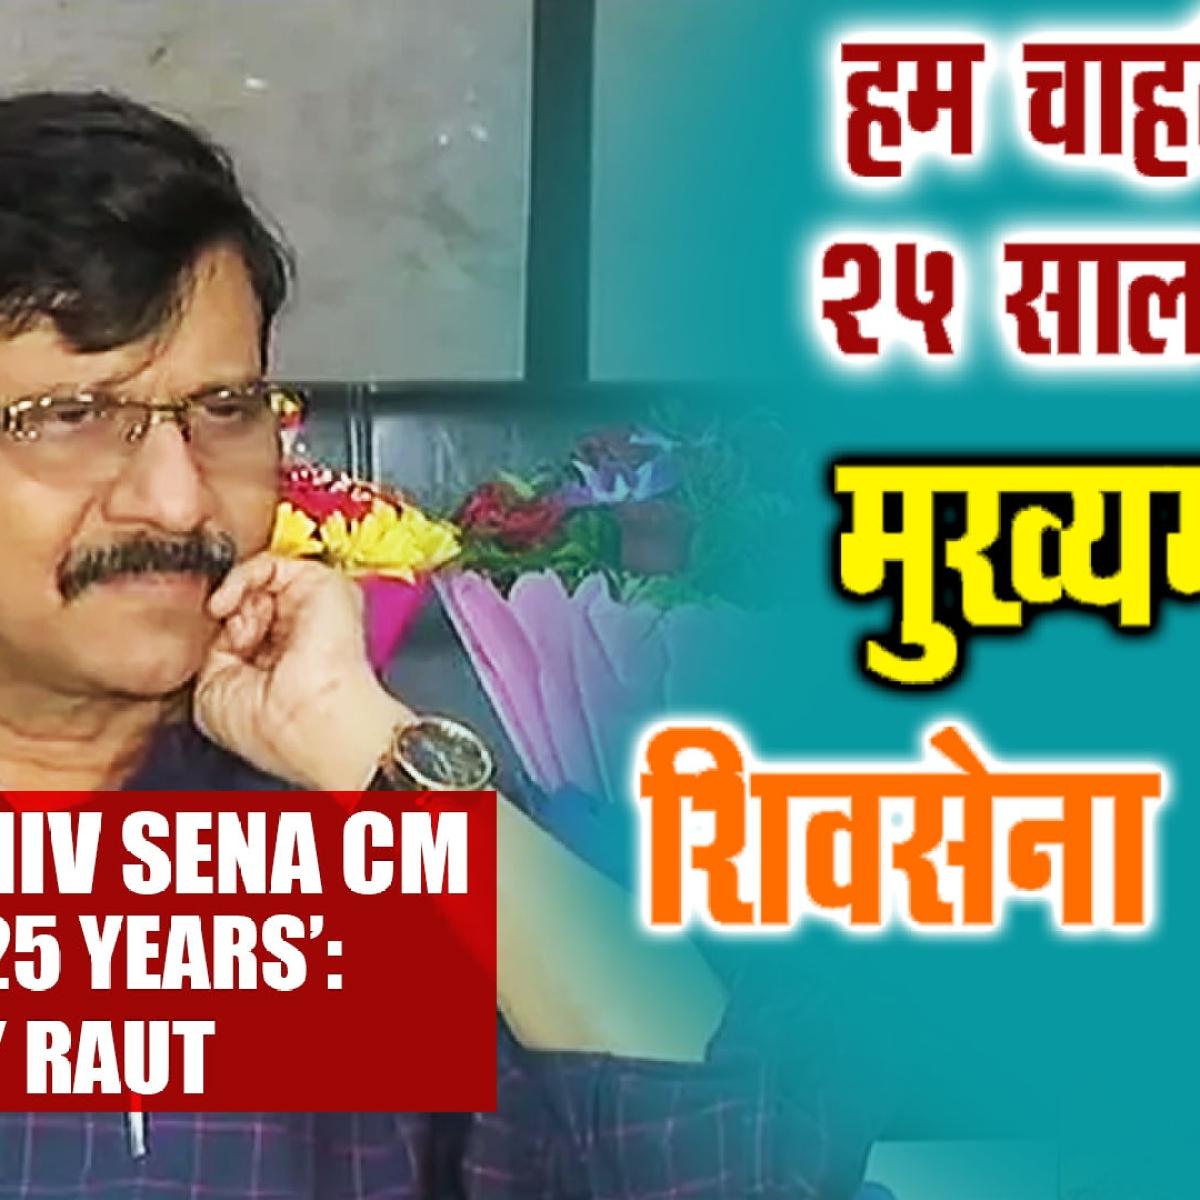 'We Want Shiv Sena CM For Next 25 Years': Sanjay Raut